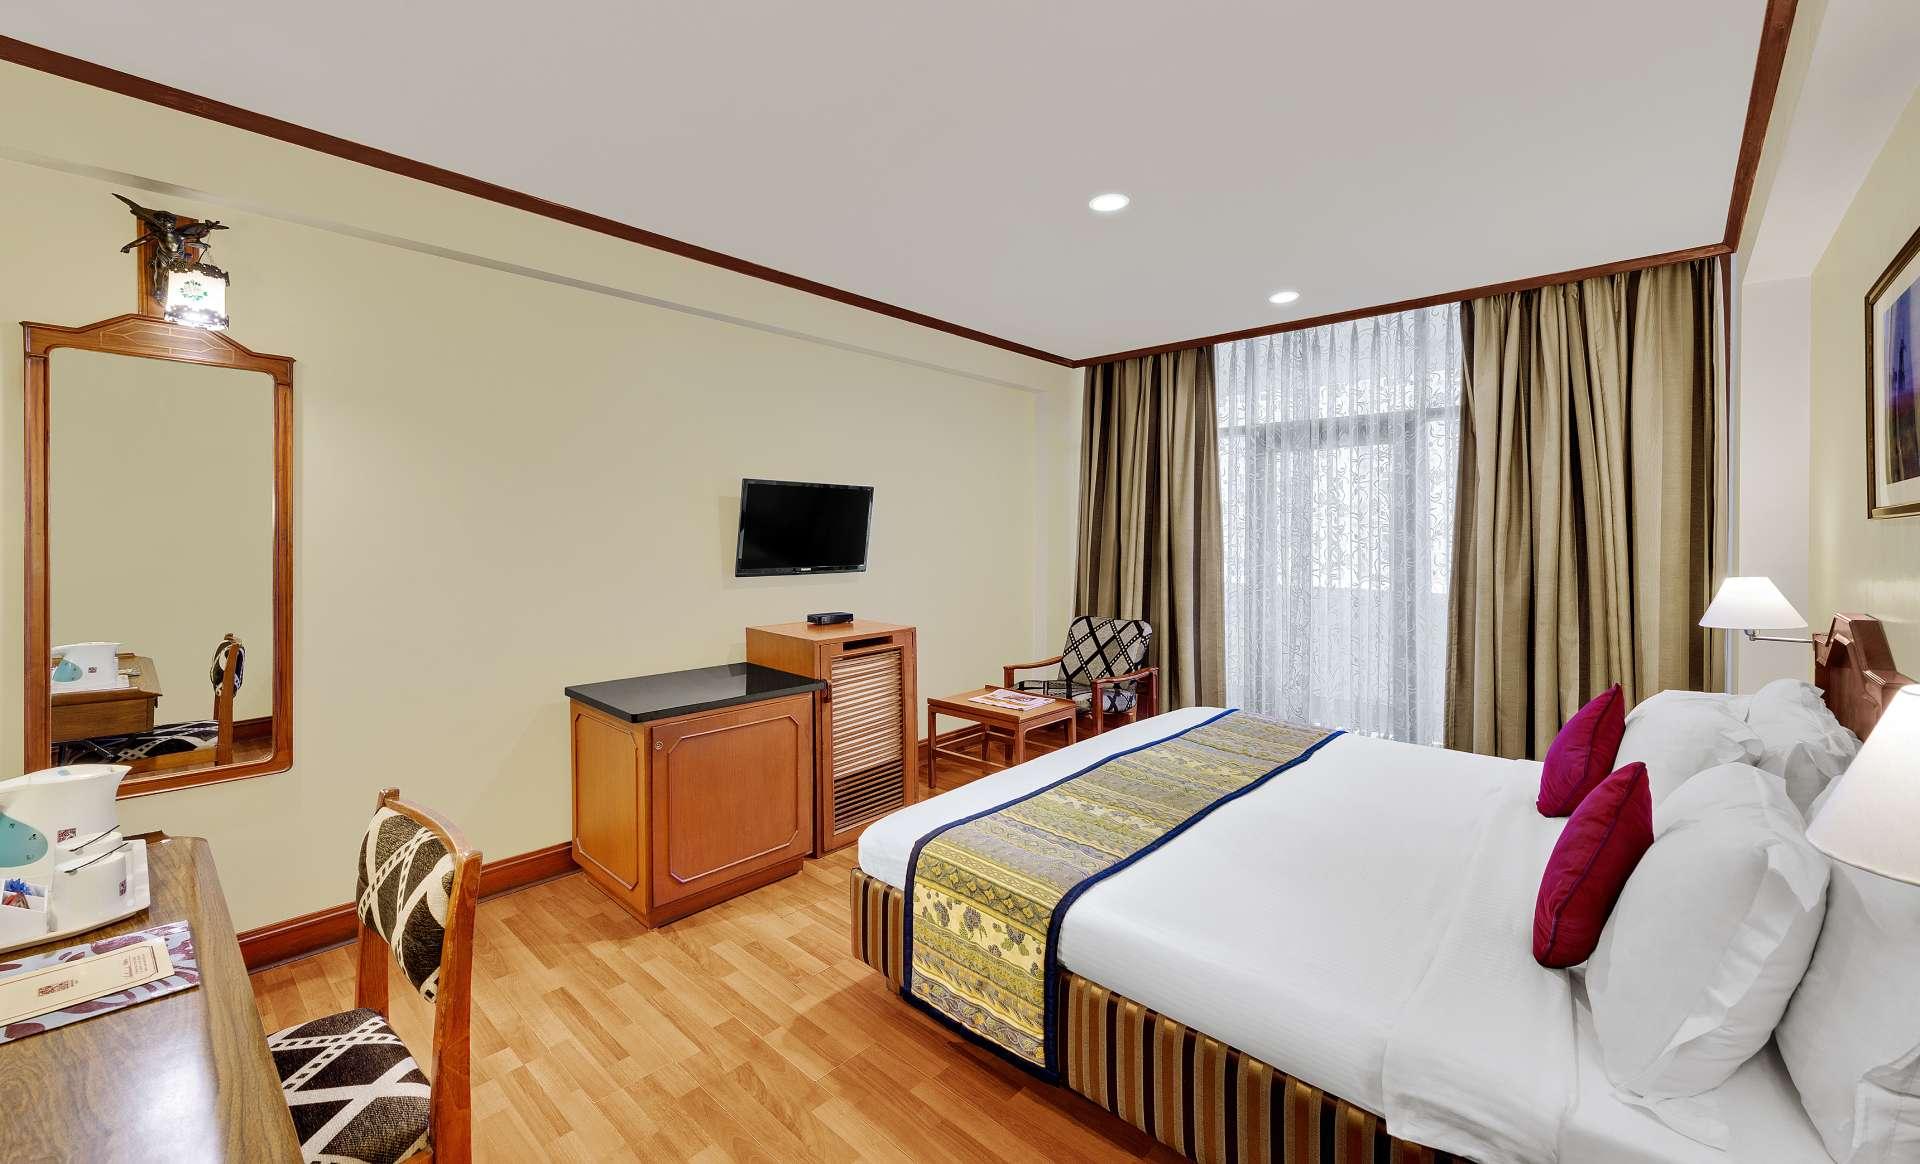 chennai deluxe room ambassador pallava tv - The Ambassador | Heritage Hotels in Mumbai, Aurangabad, Chennai - Our Rooms